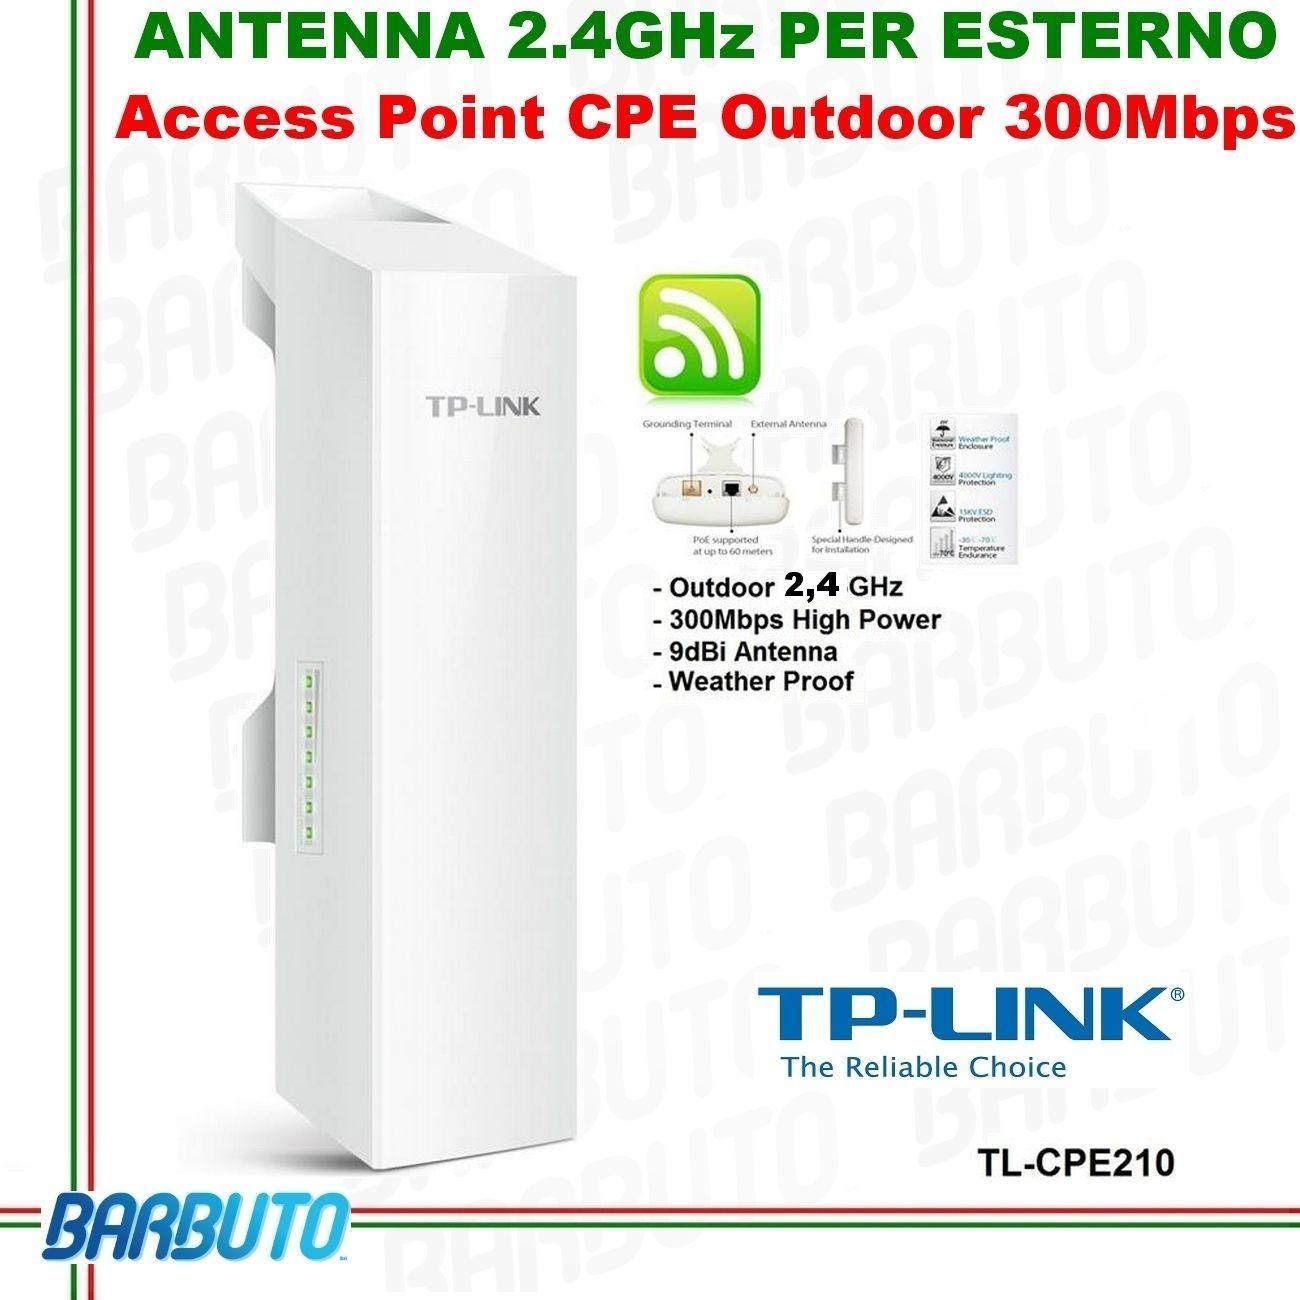 Antenna Wireless 24ghz Wlan Outdoor Esterno Interno Access Point Cpe210 Acces Wifi Tplink 300mbps 9dbi Cpe